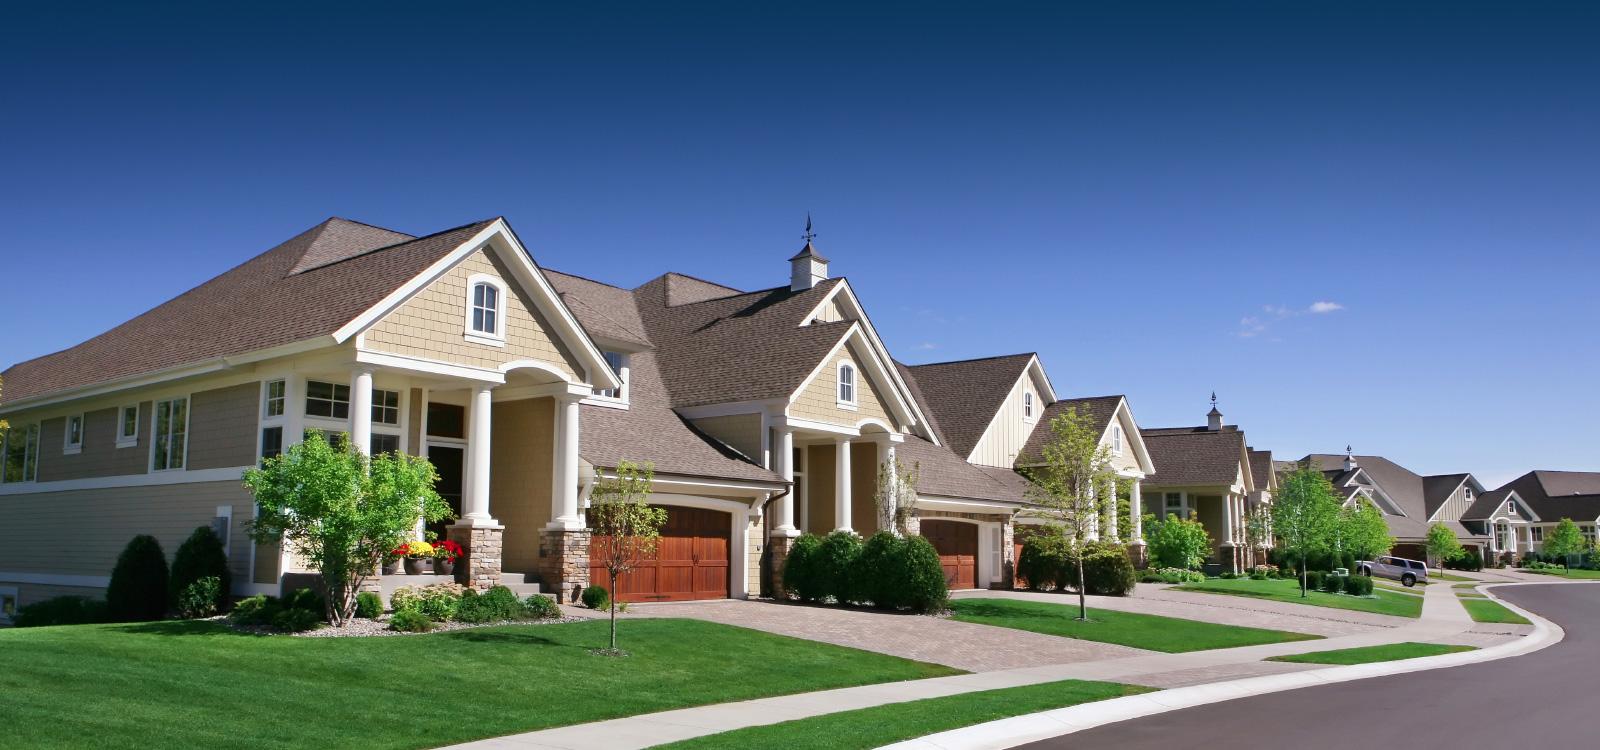 Home Inspection Checklist Kansas City